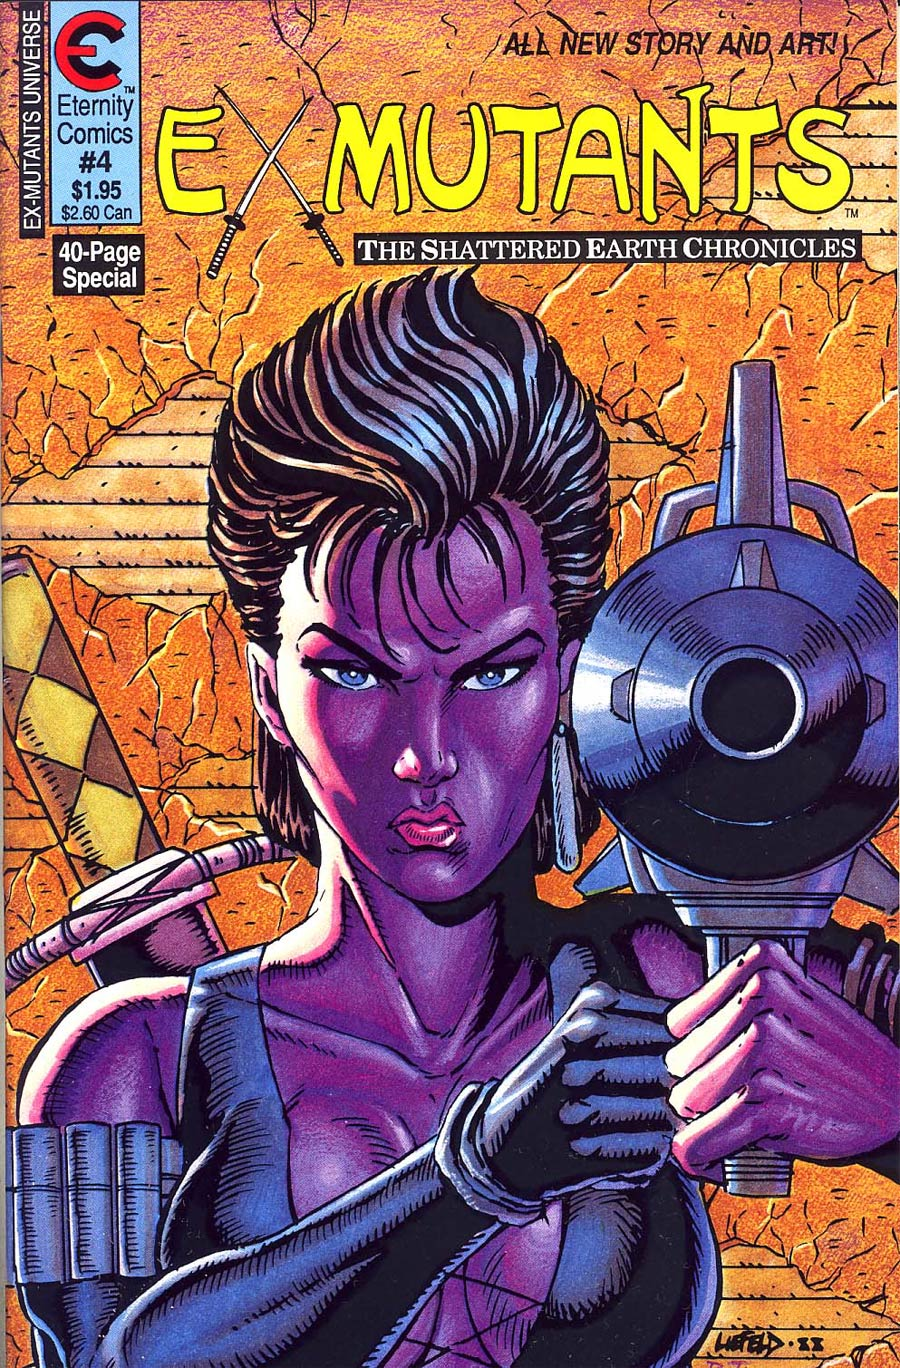 Ex-Mutants Shattered Earth Chronicles #4